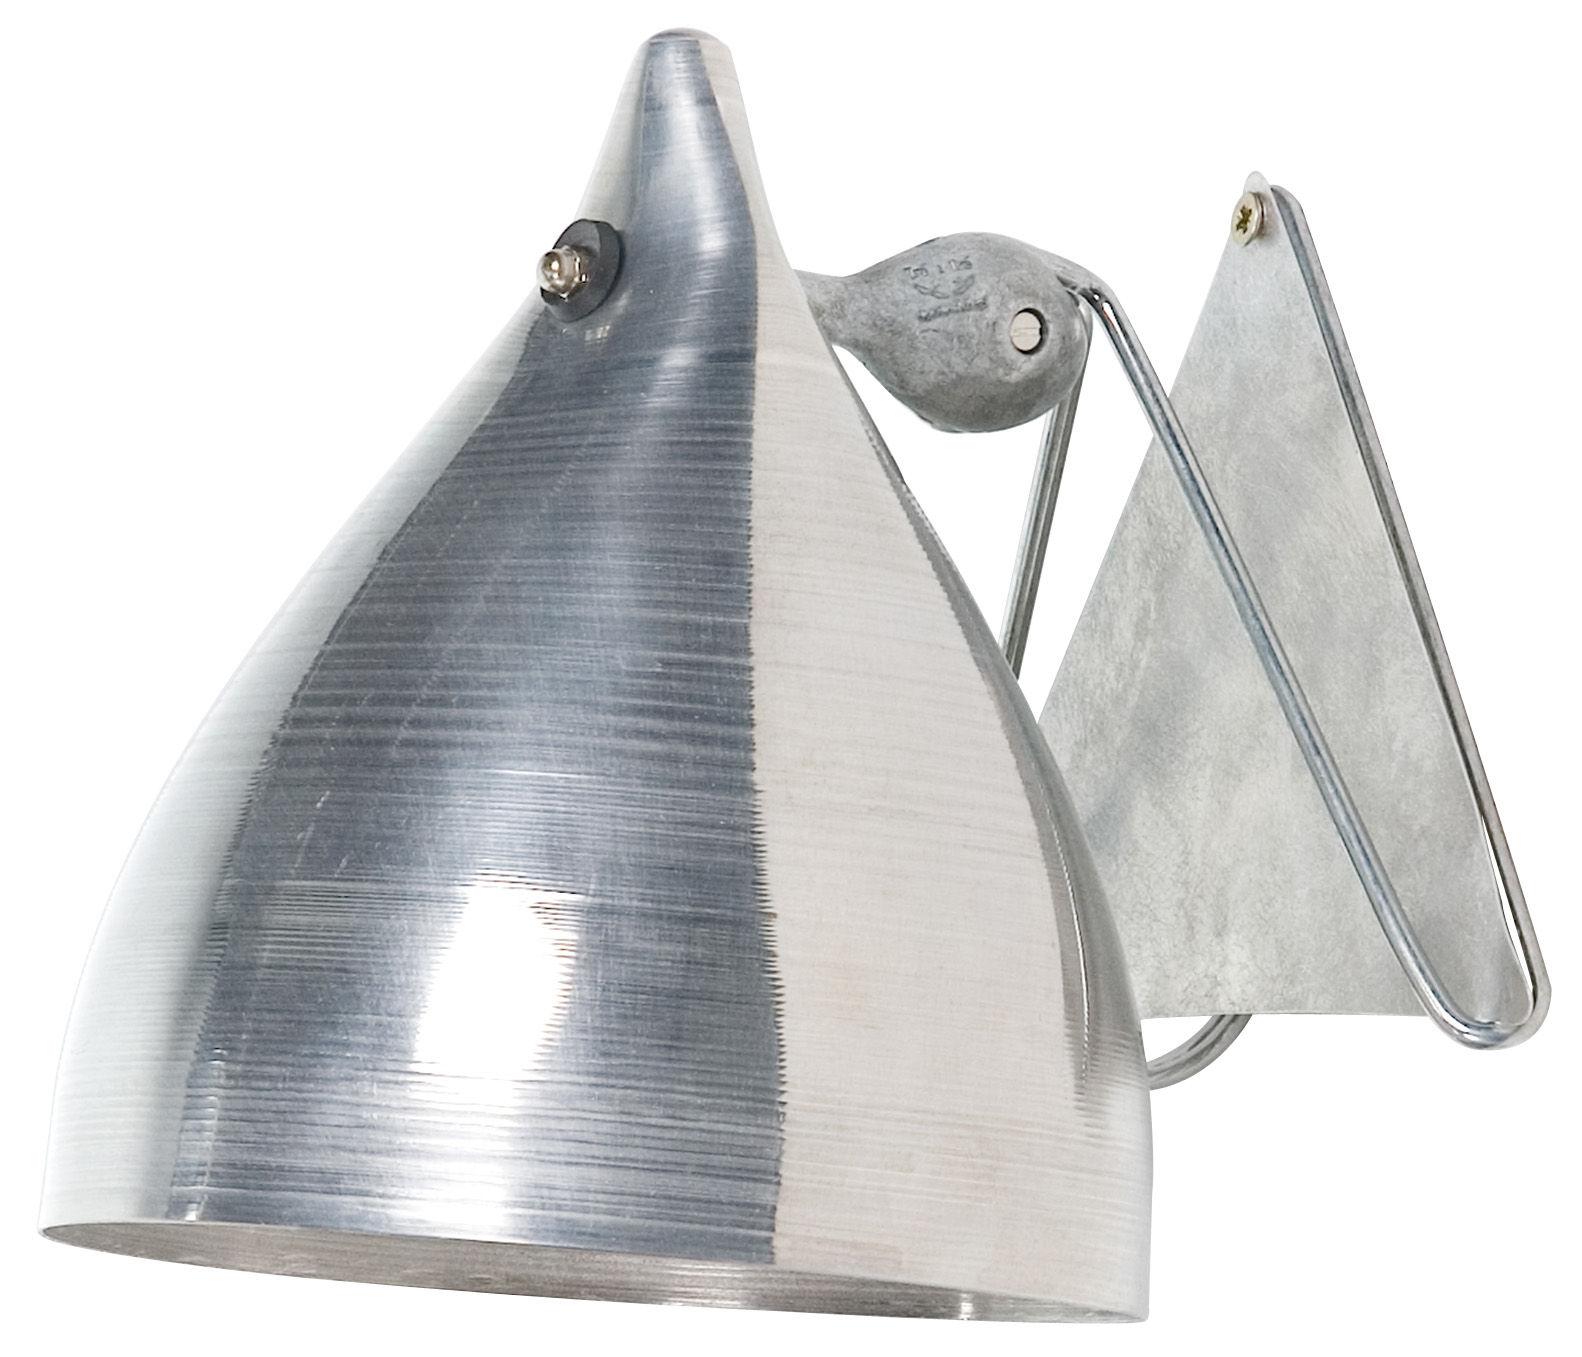 Leuchten - Wandleuchten - Cornette Wandleuchte aus Aluminium - Tsé-Tsé - Aluminium - eloxiertes Aluminium